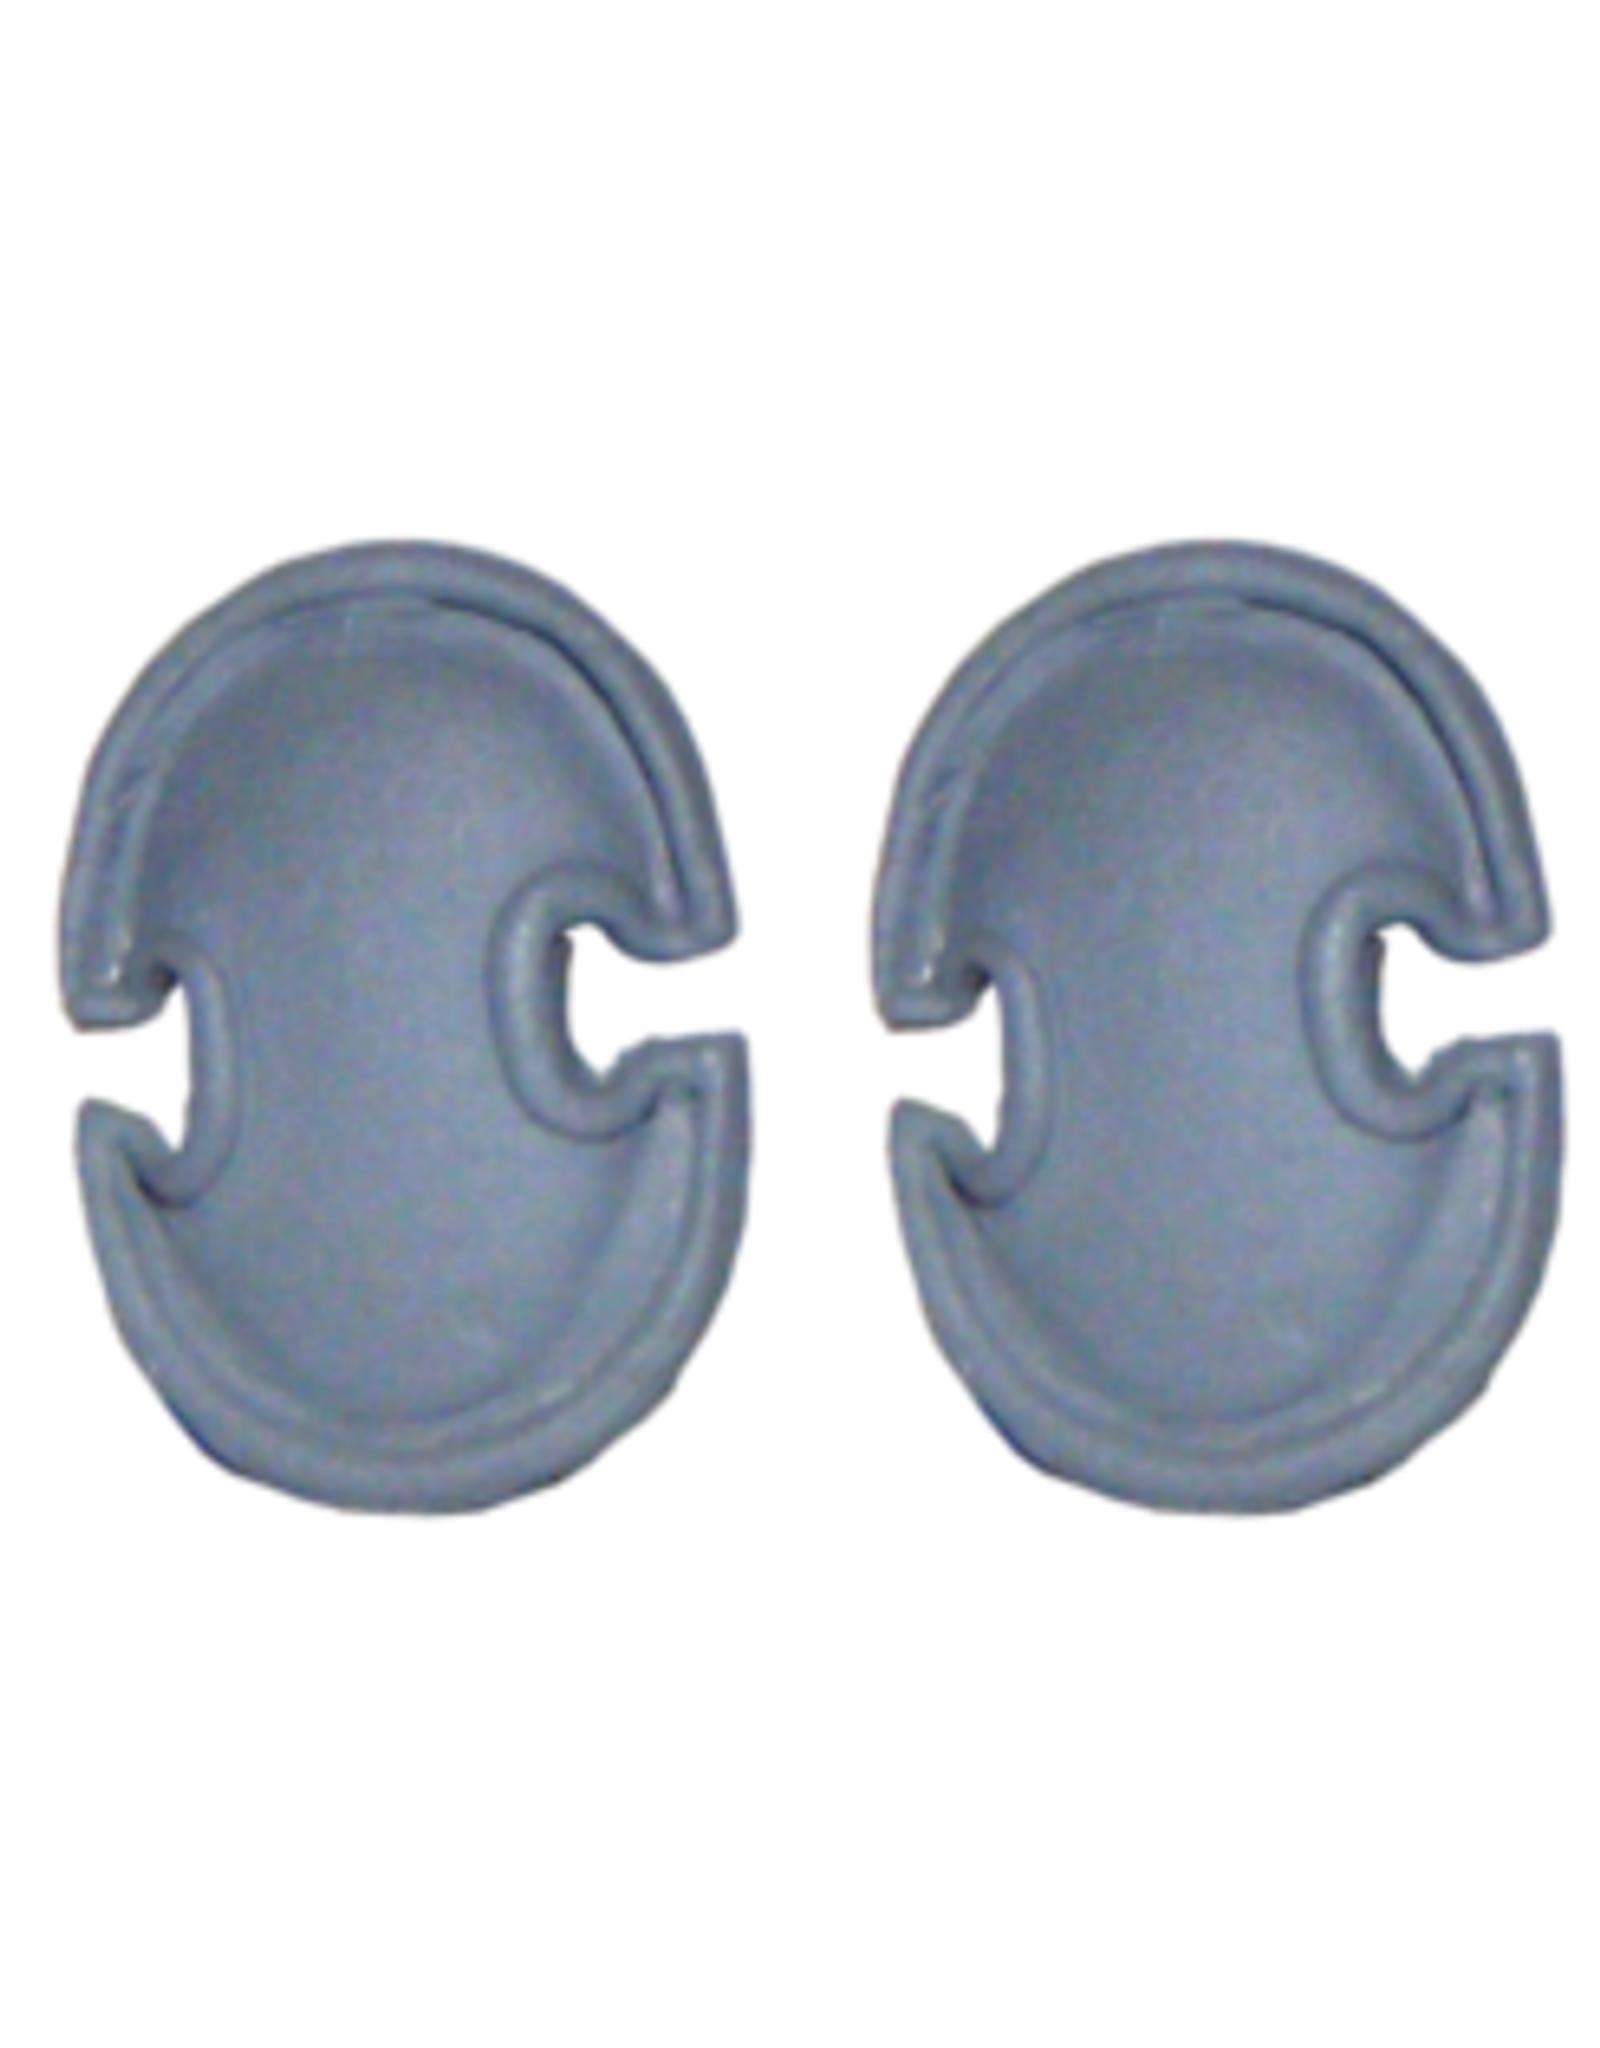 Xyston ANC20295 - Boeotian shields